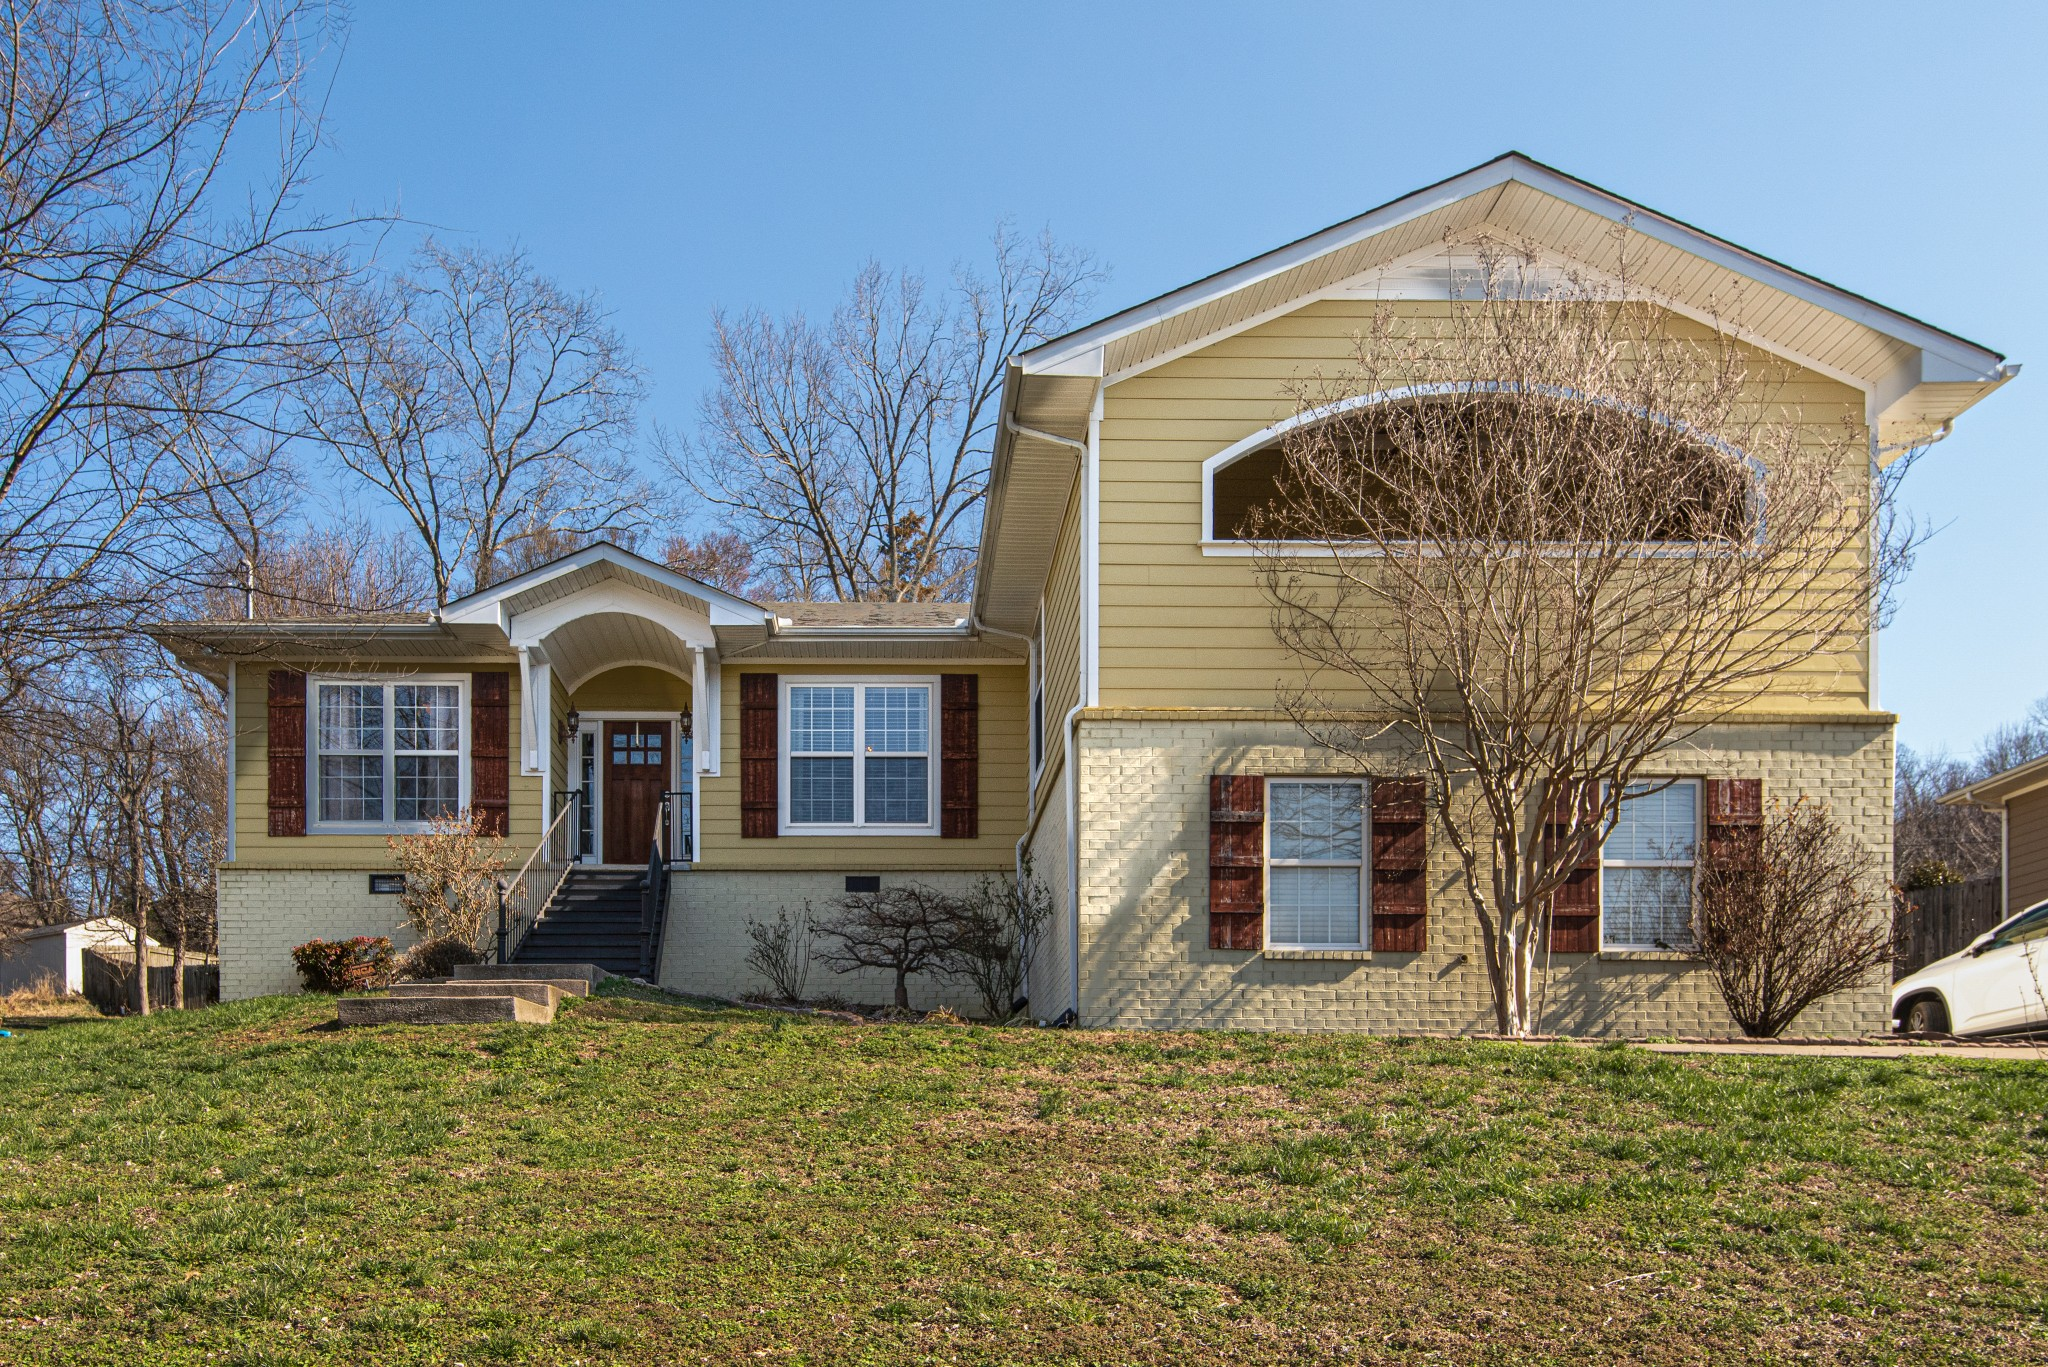 439 Williamsport Dr Property Photo - Smyrna, TN real estate listing